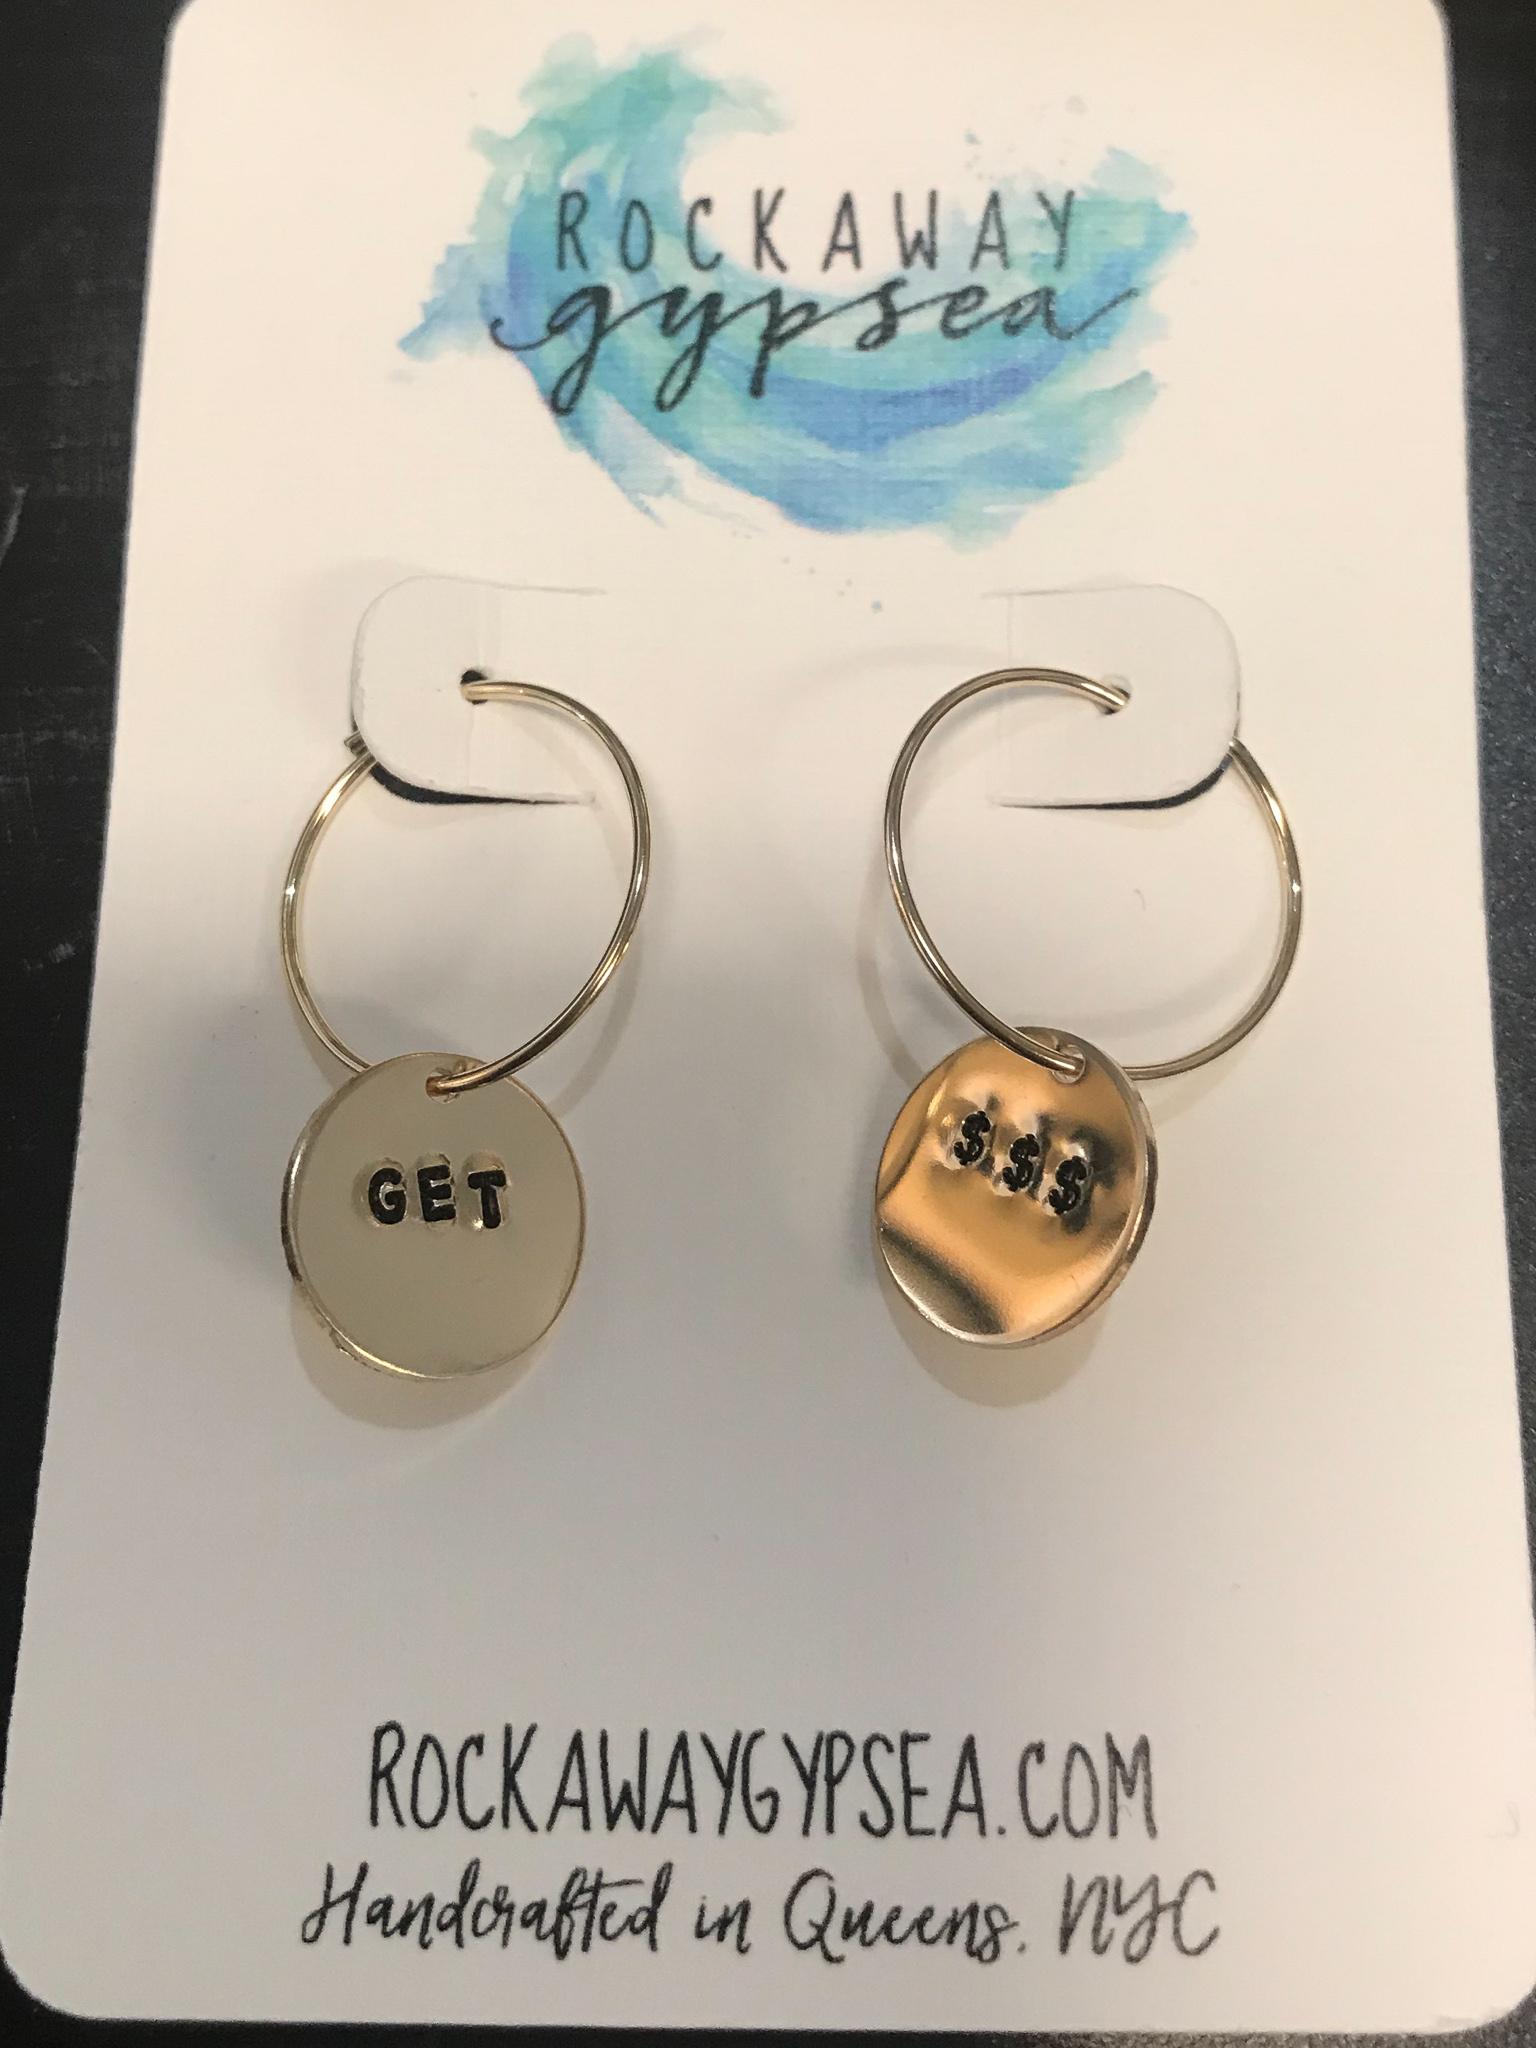 Rockaway Gypsea Stamped Hoop Earring 14K Fill - Get $$$